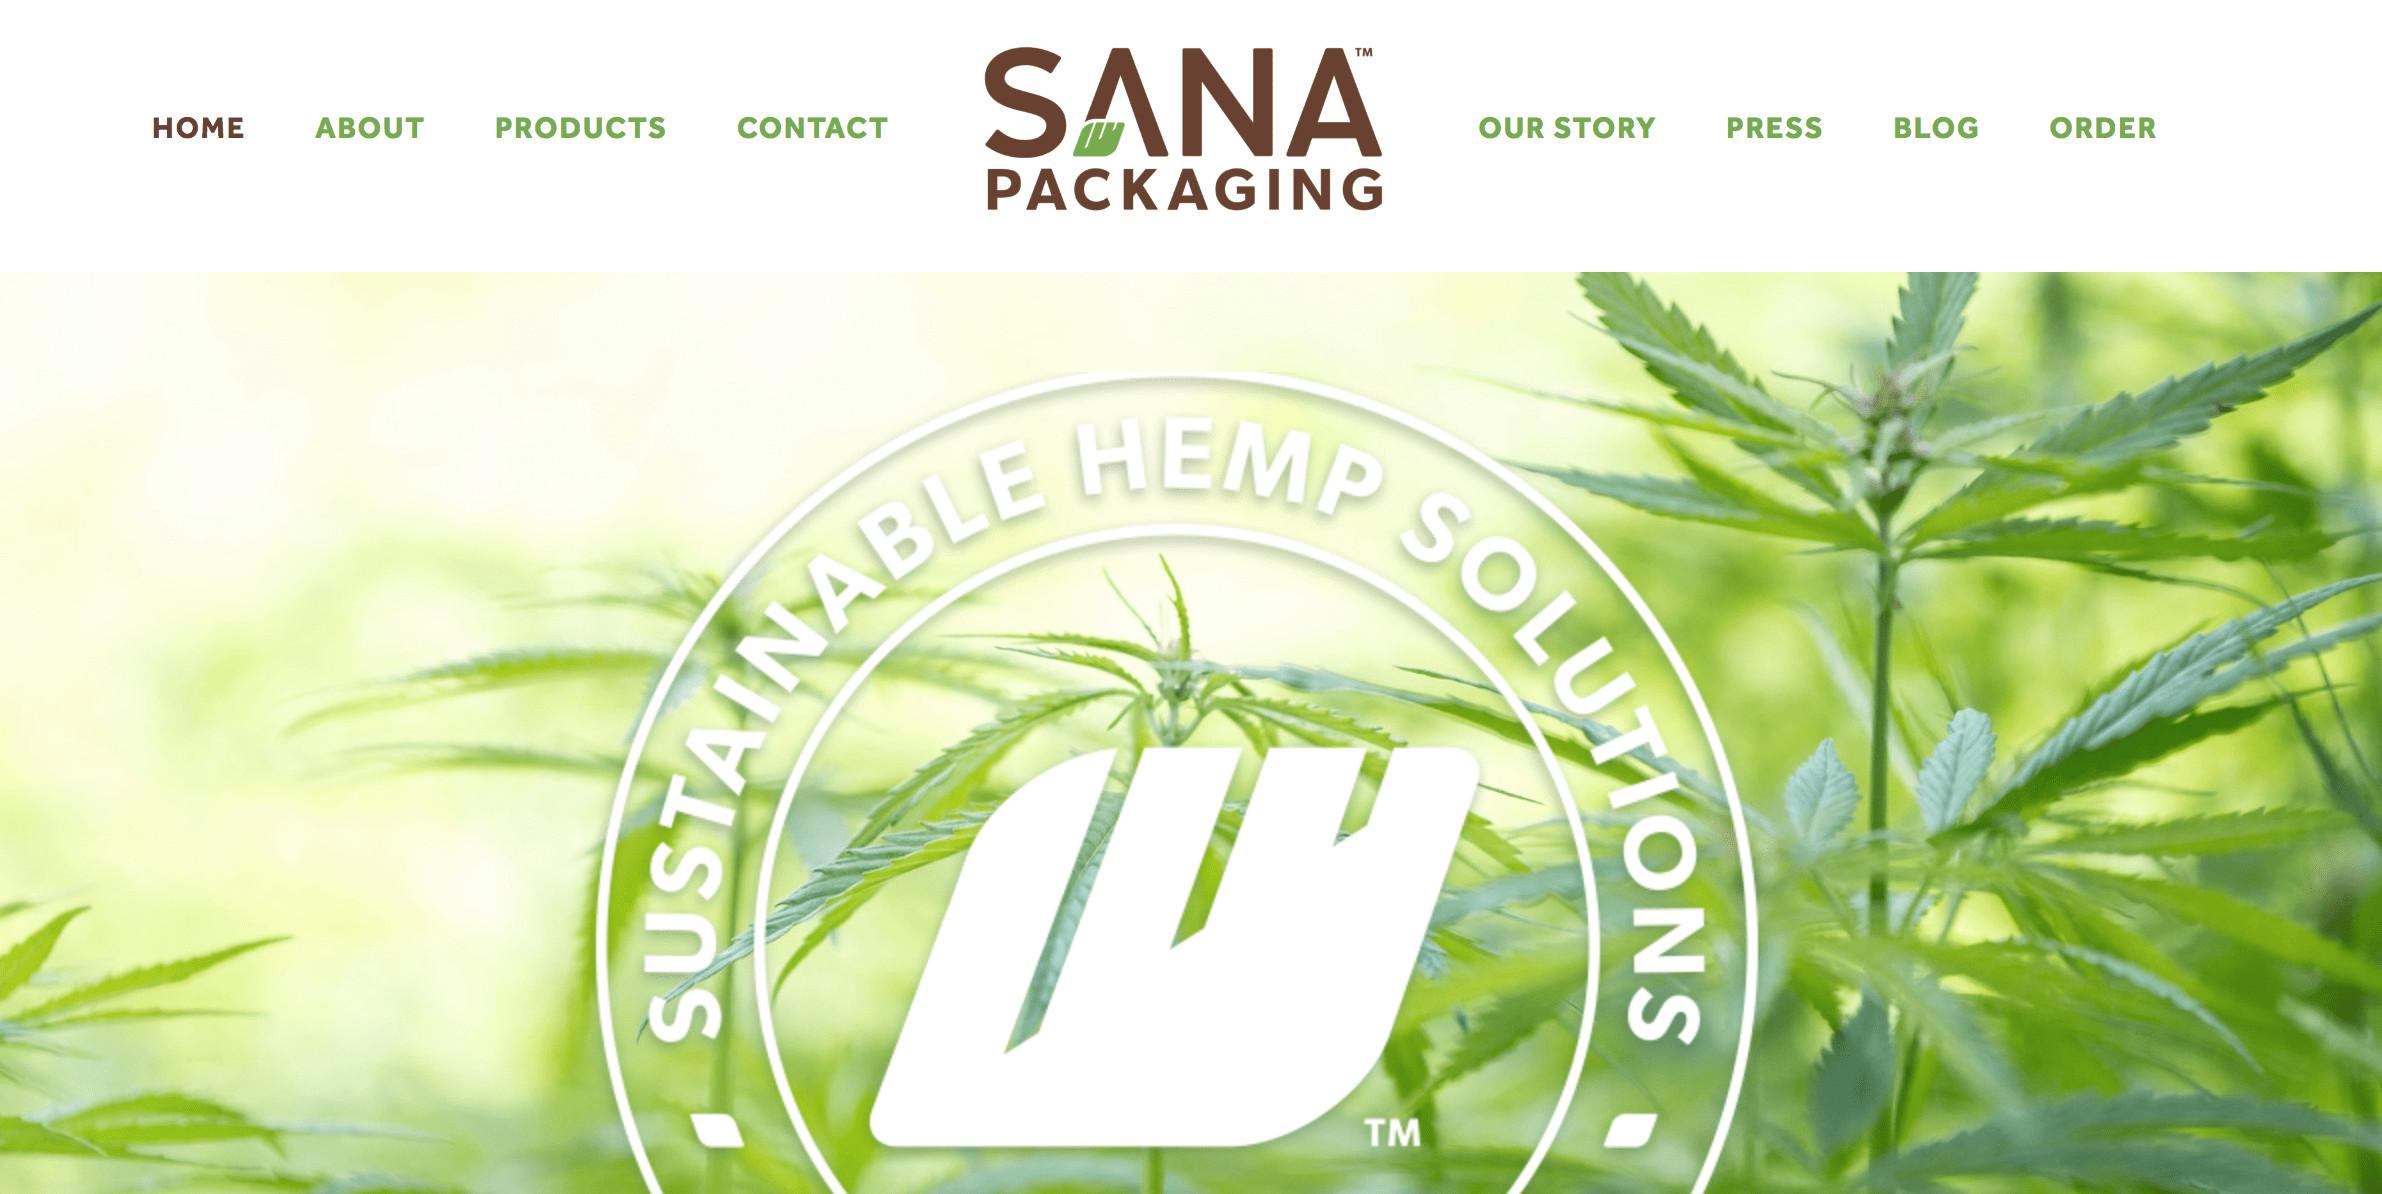 Sana Packaging website